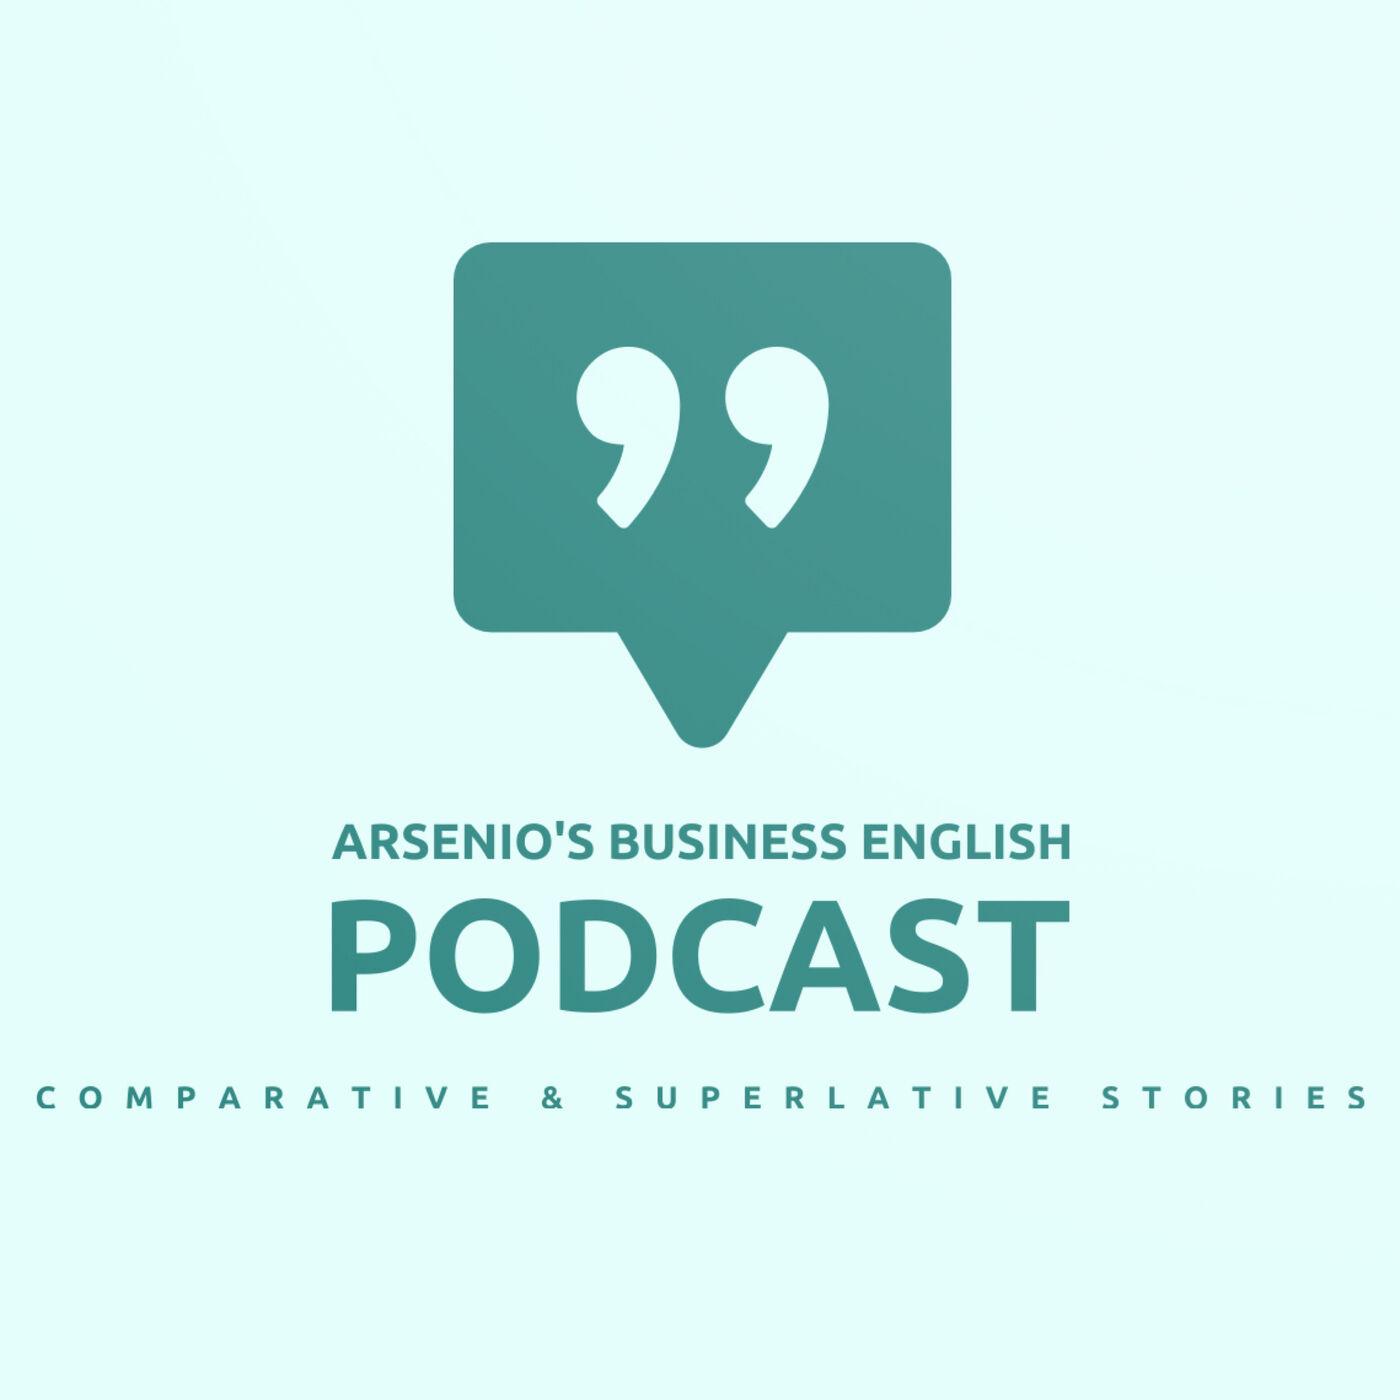 Arsenio's Business English Podcast | Season 6: Episode 23 | Grammar: Comparative & Superlative Moments